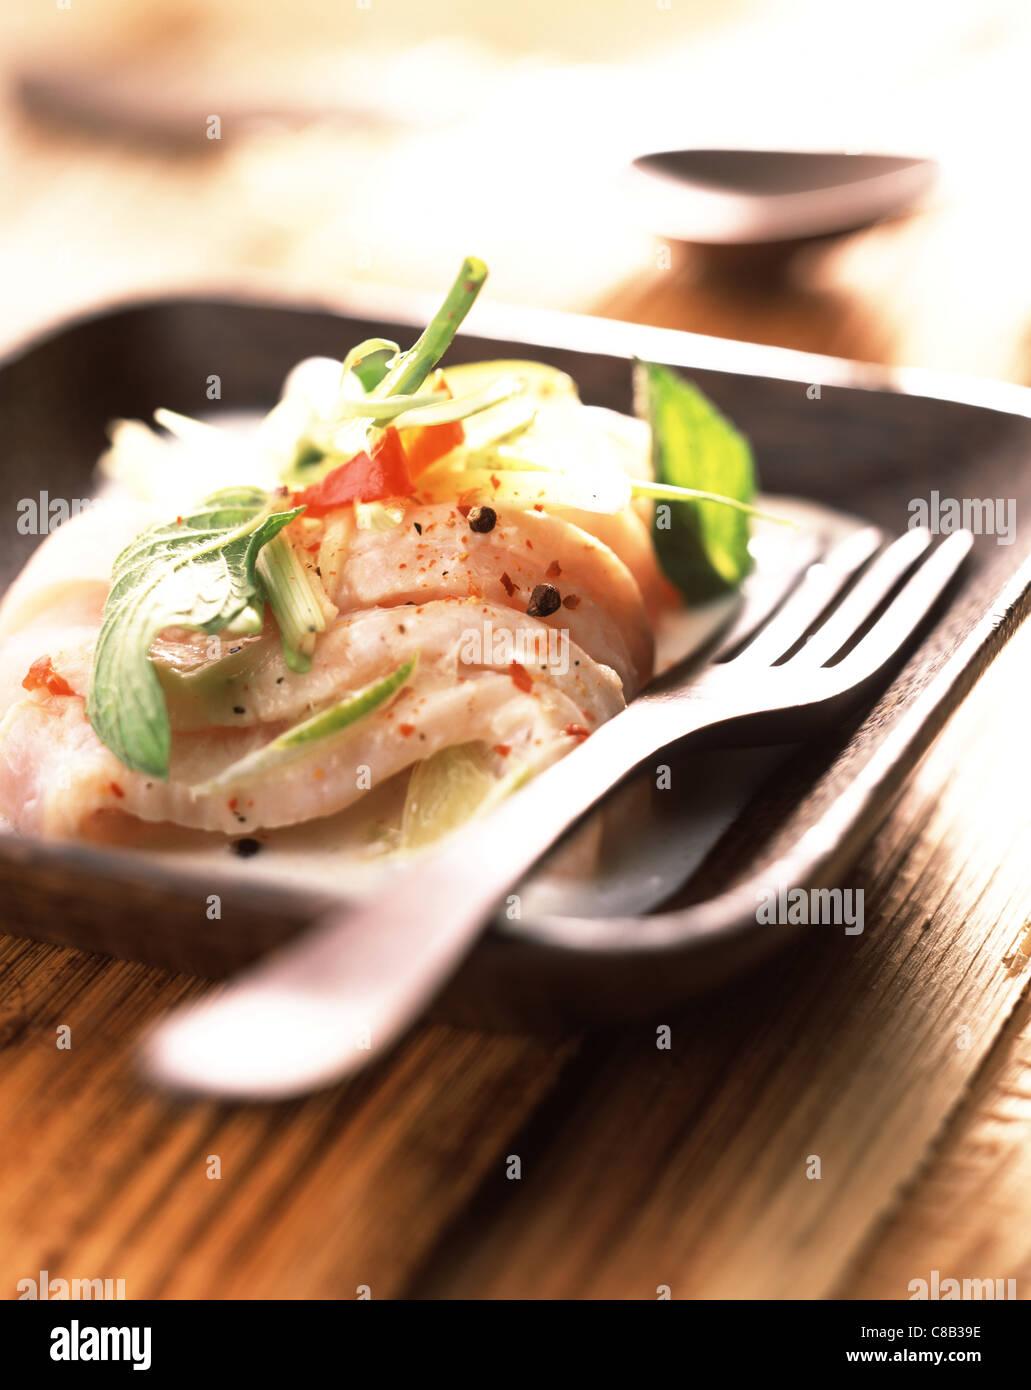 Grouper fish marinated in coconut milk - Stock Image